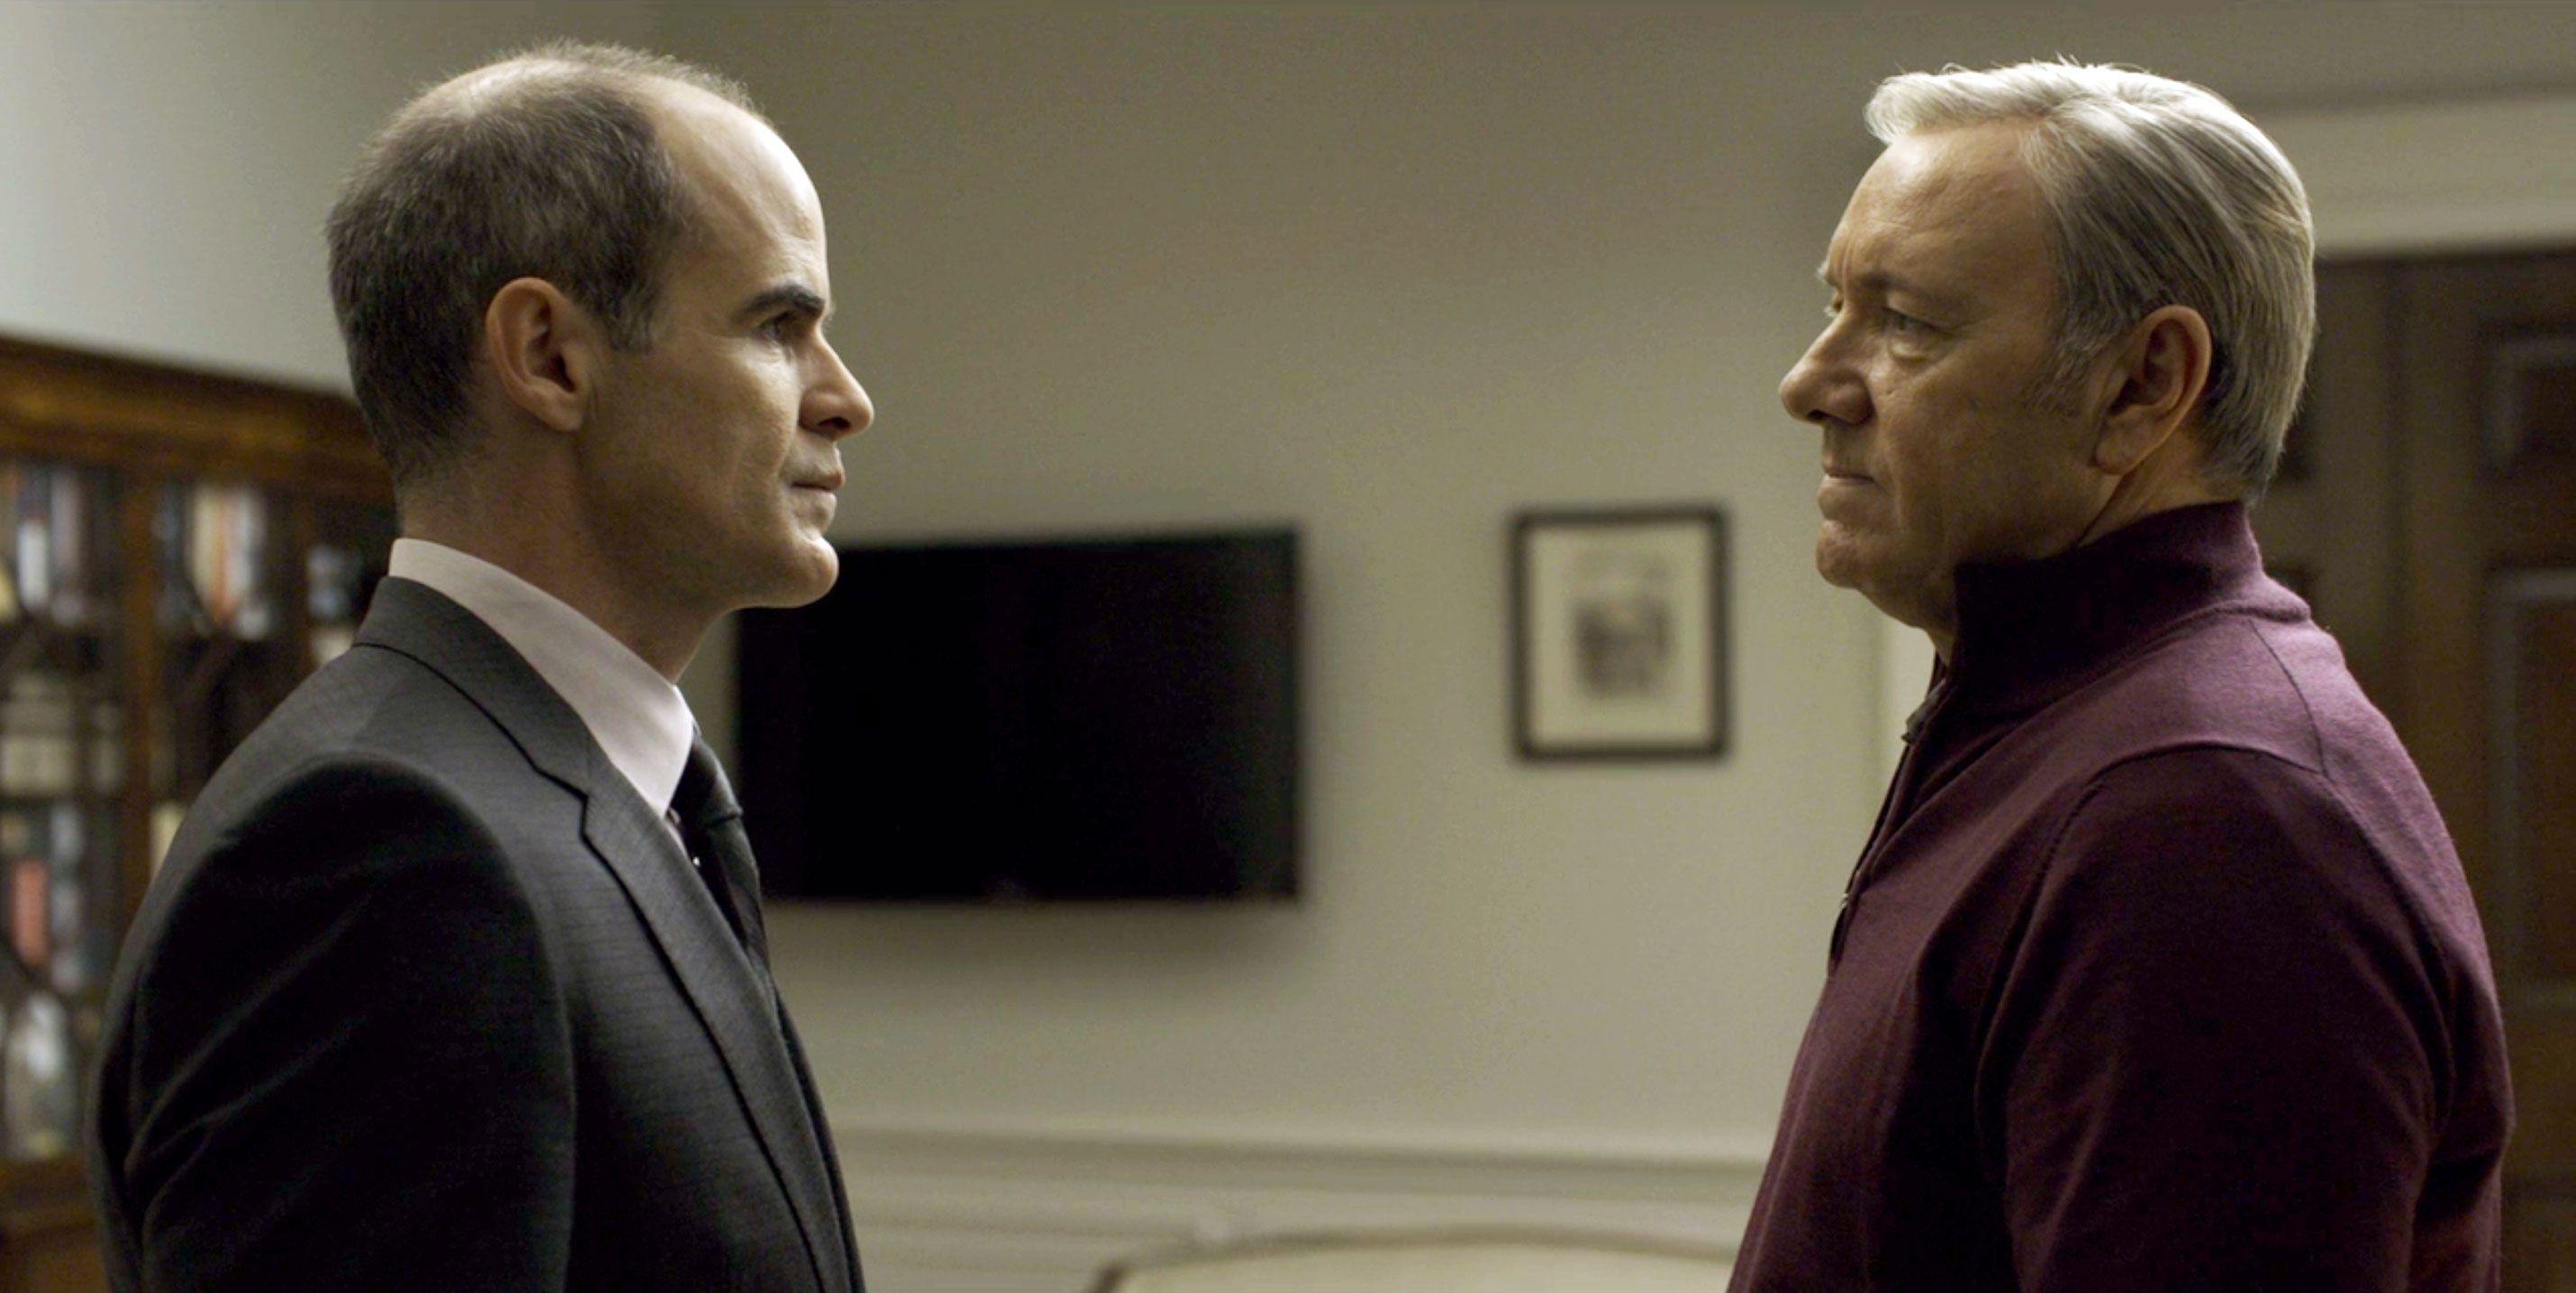 House of Cards Season 3, Episode 12 Recap: Things Fall Apart